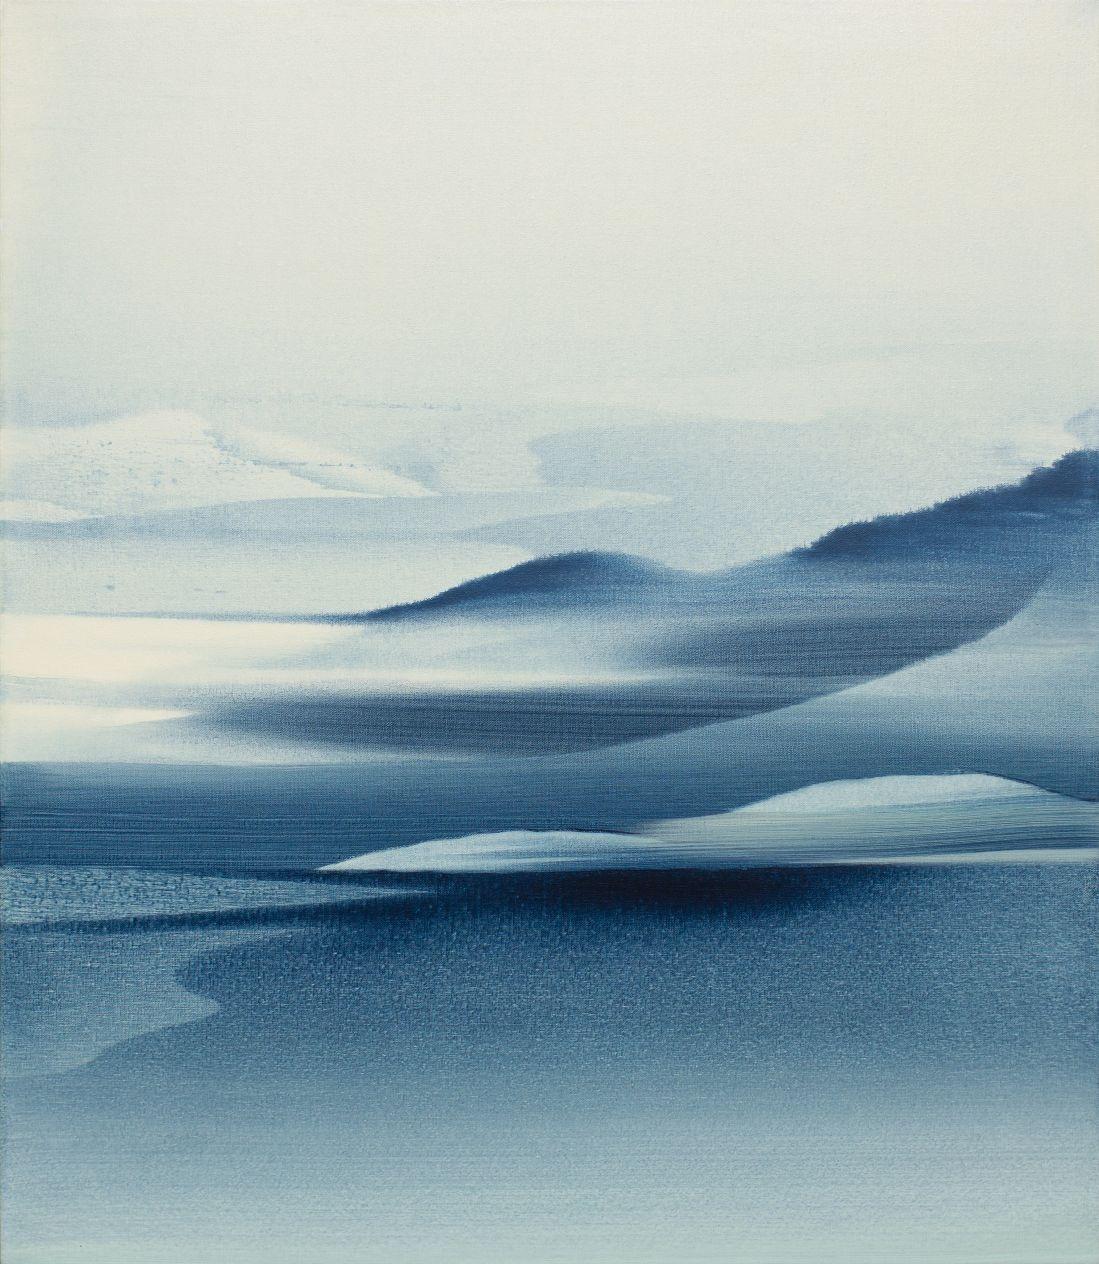 Eva Ullrich, Floe, The Auction Collective